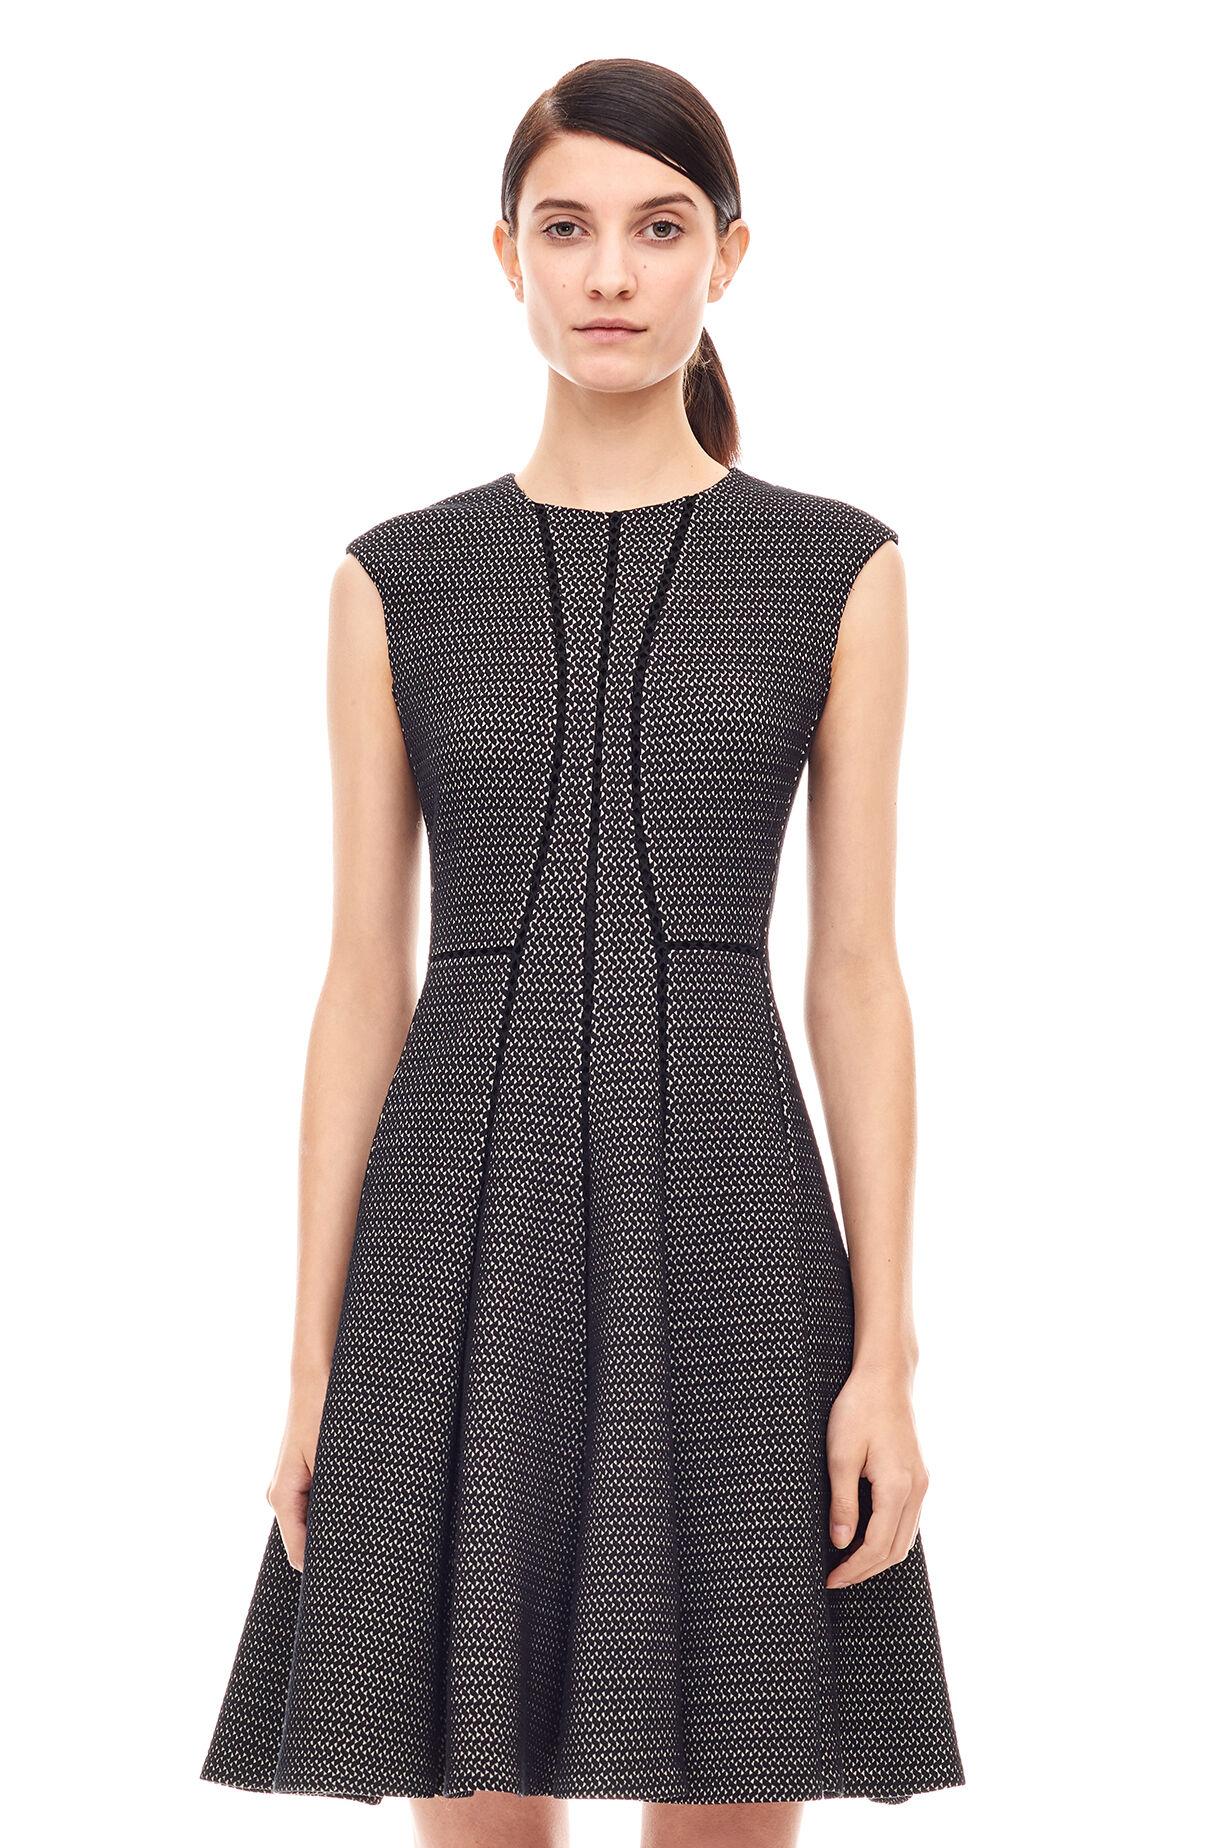 Textured Stretch Knit Dress - Rebecca Taylor